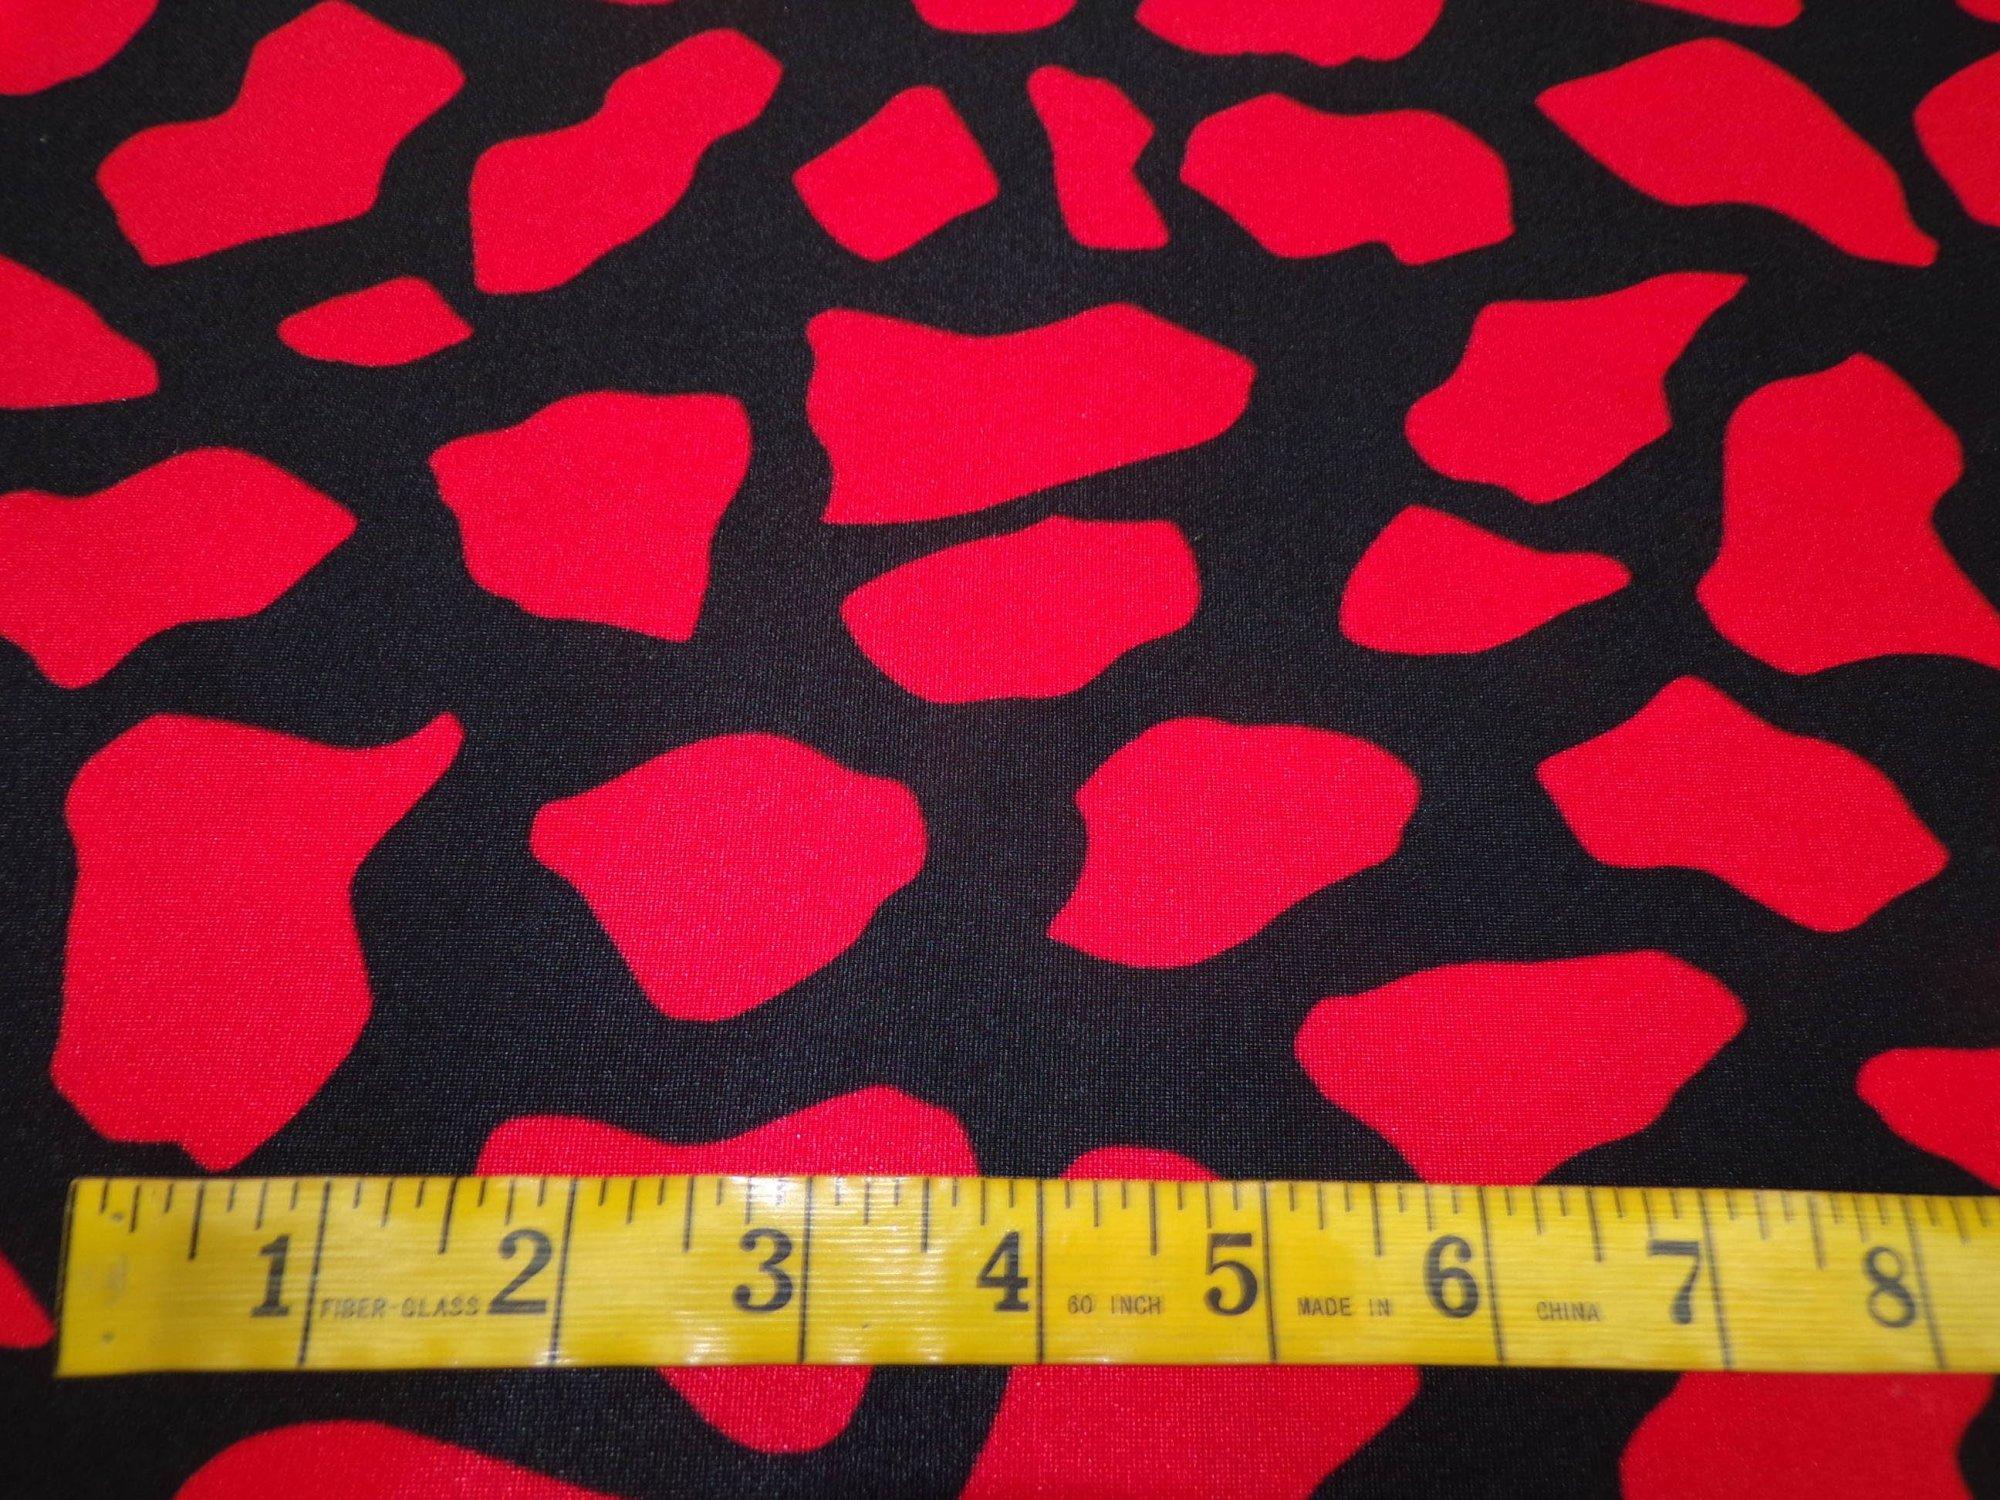 Nylon Lycra Swimwear - Black and Red